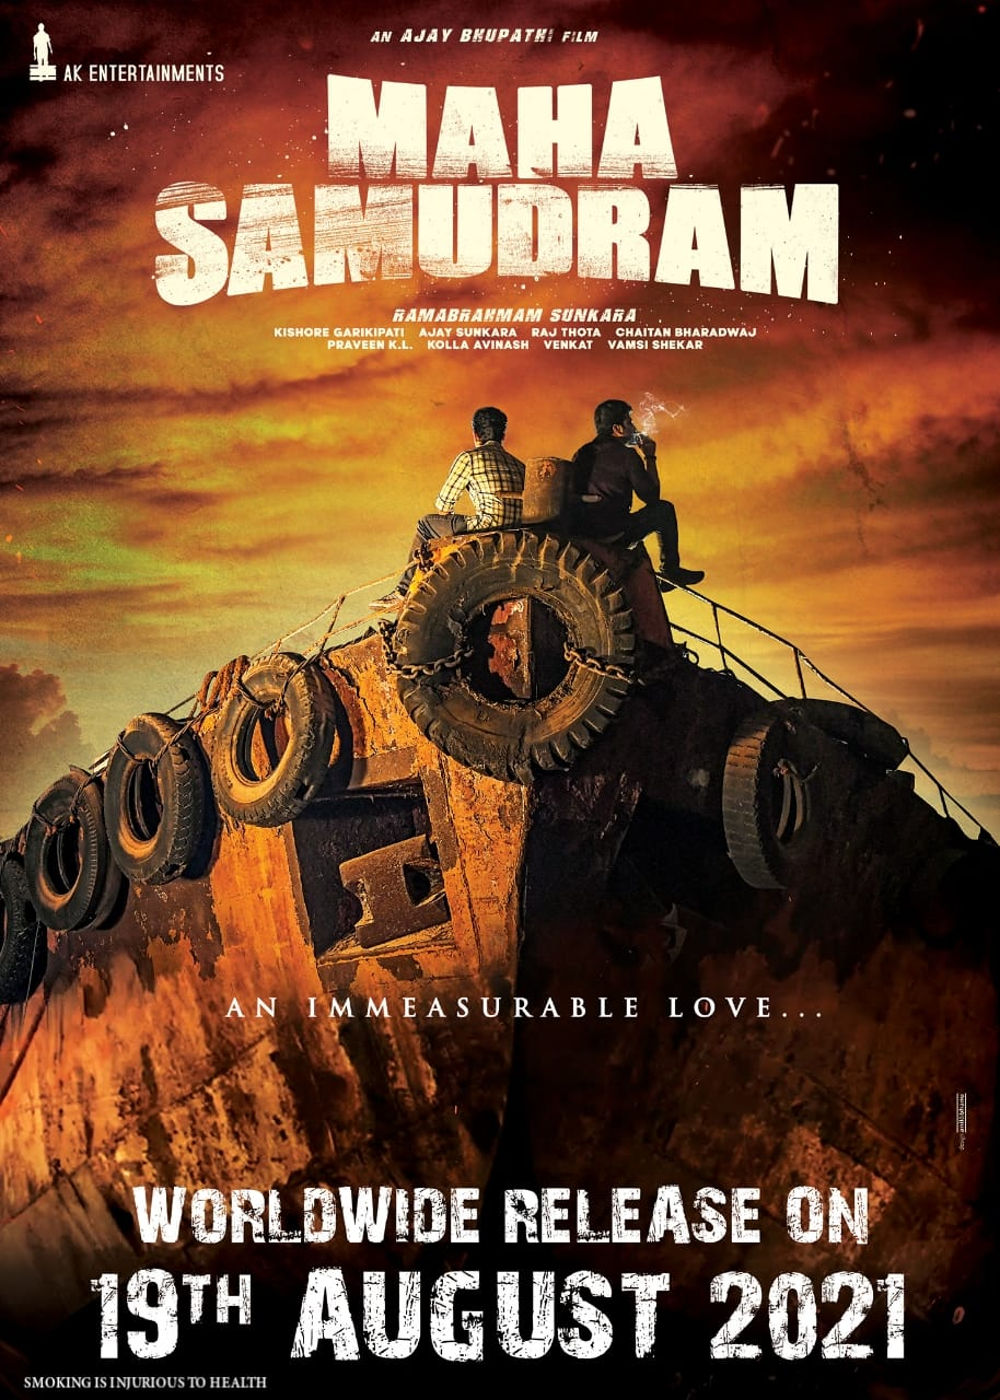 Sharwanand, Siddharth, Maha Samudram Releasing On August 19th